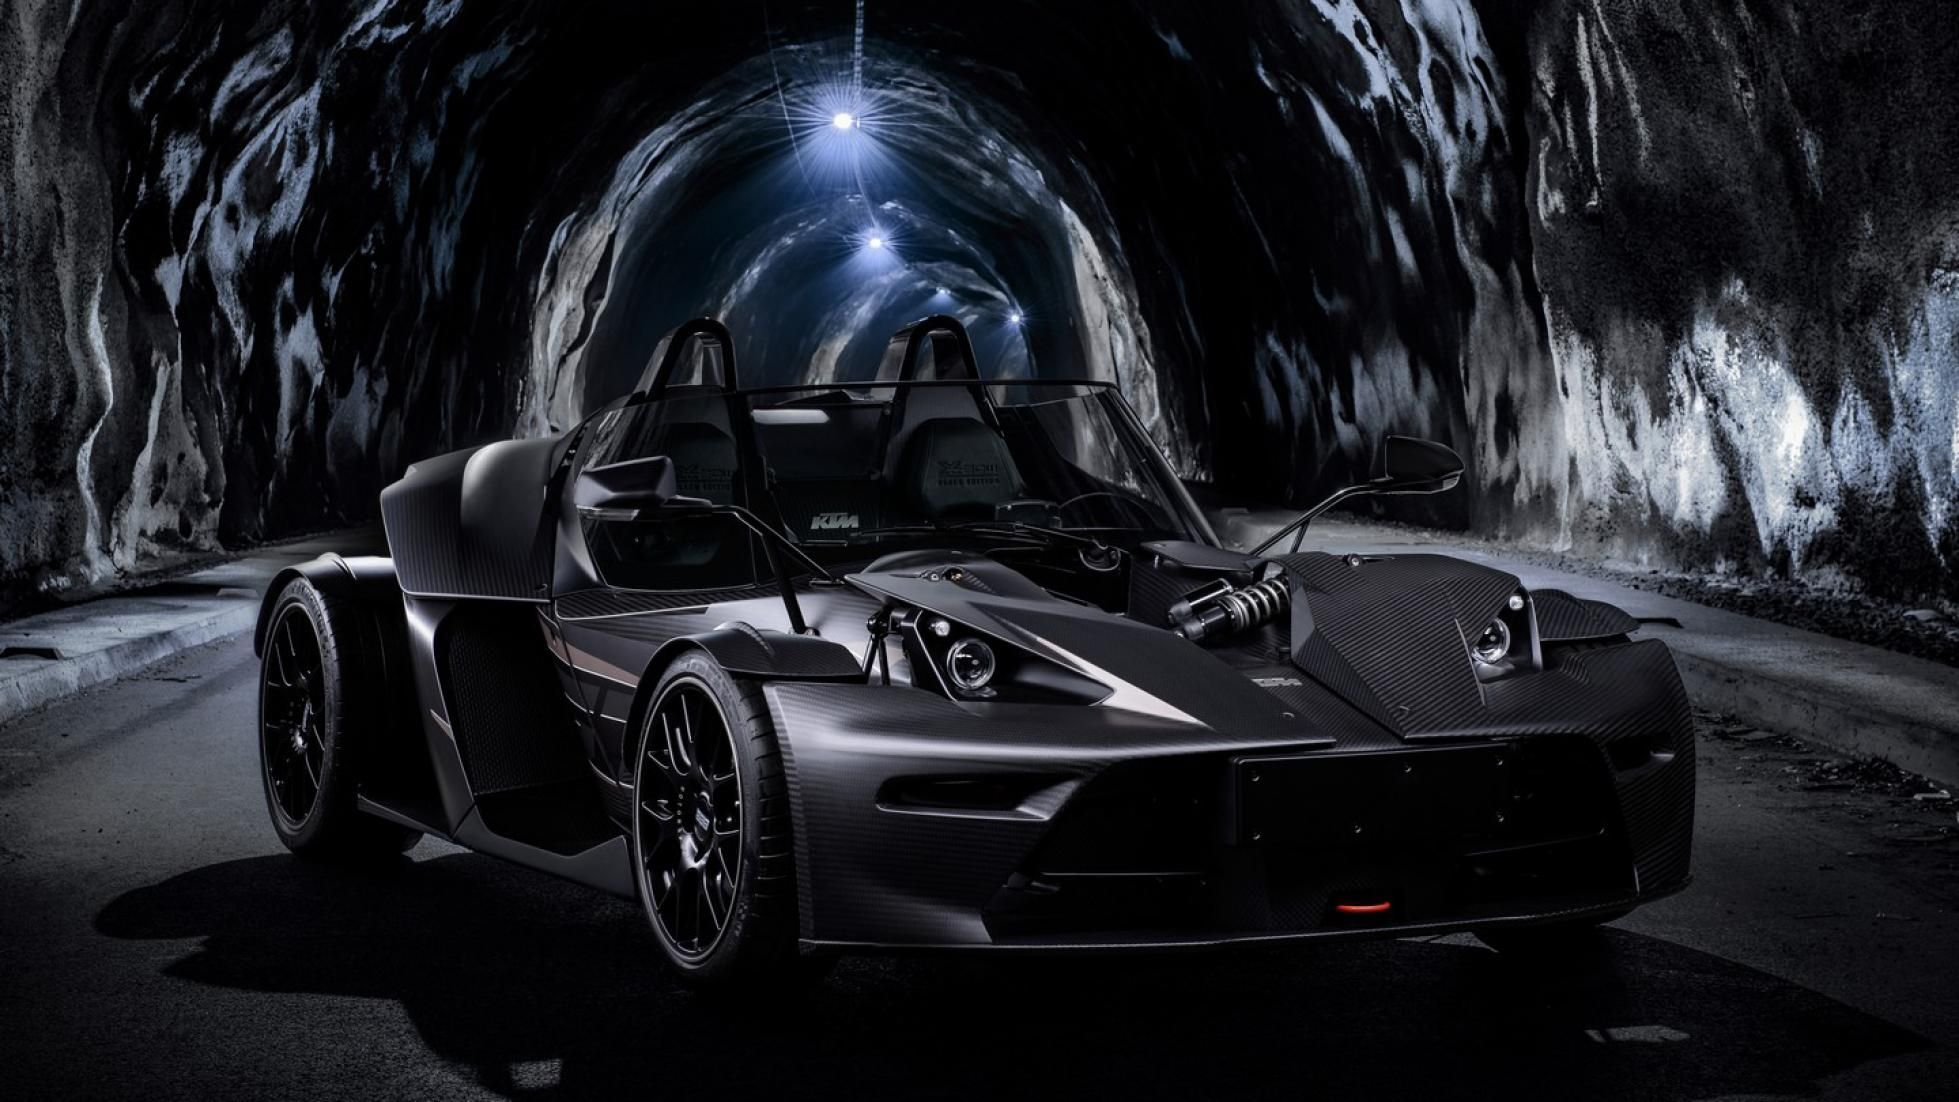 Ktm X Bow Black Edition Packs Carbon Fiber Body Geneva Motor